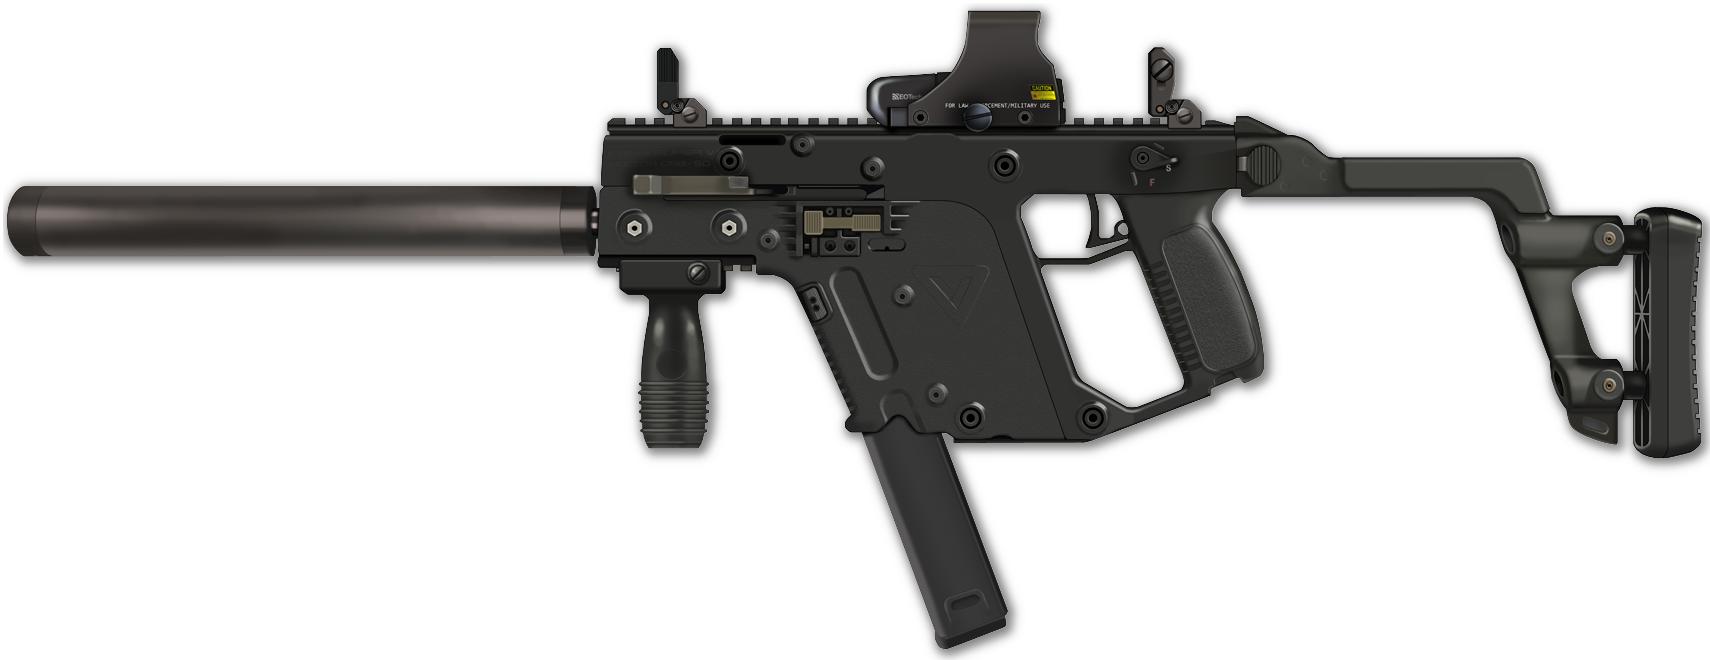 kriss vector submachine gun side view google search